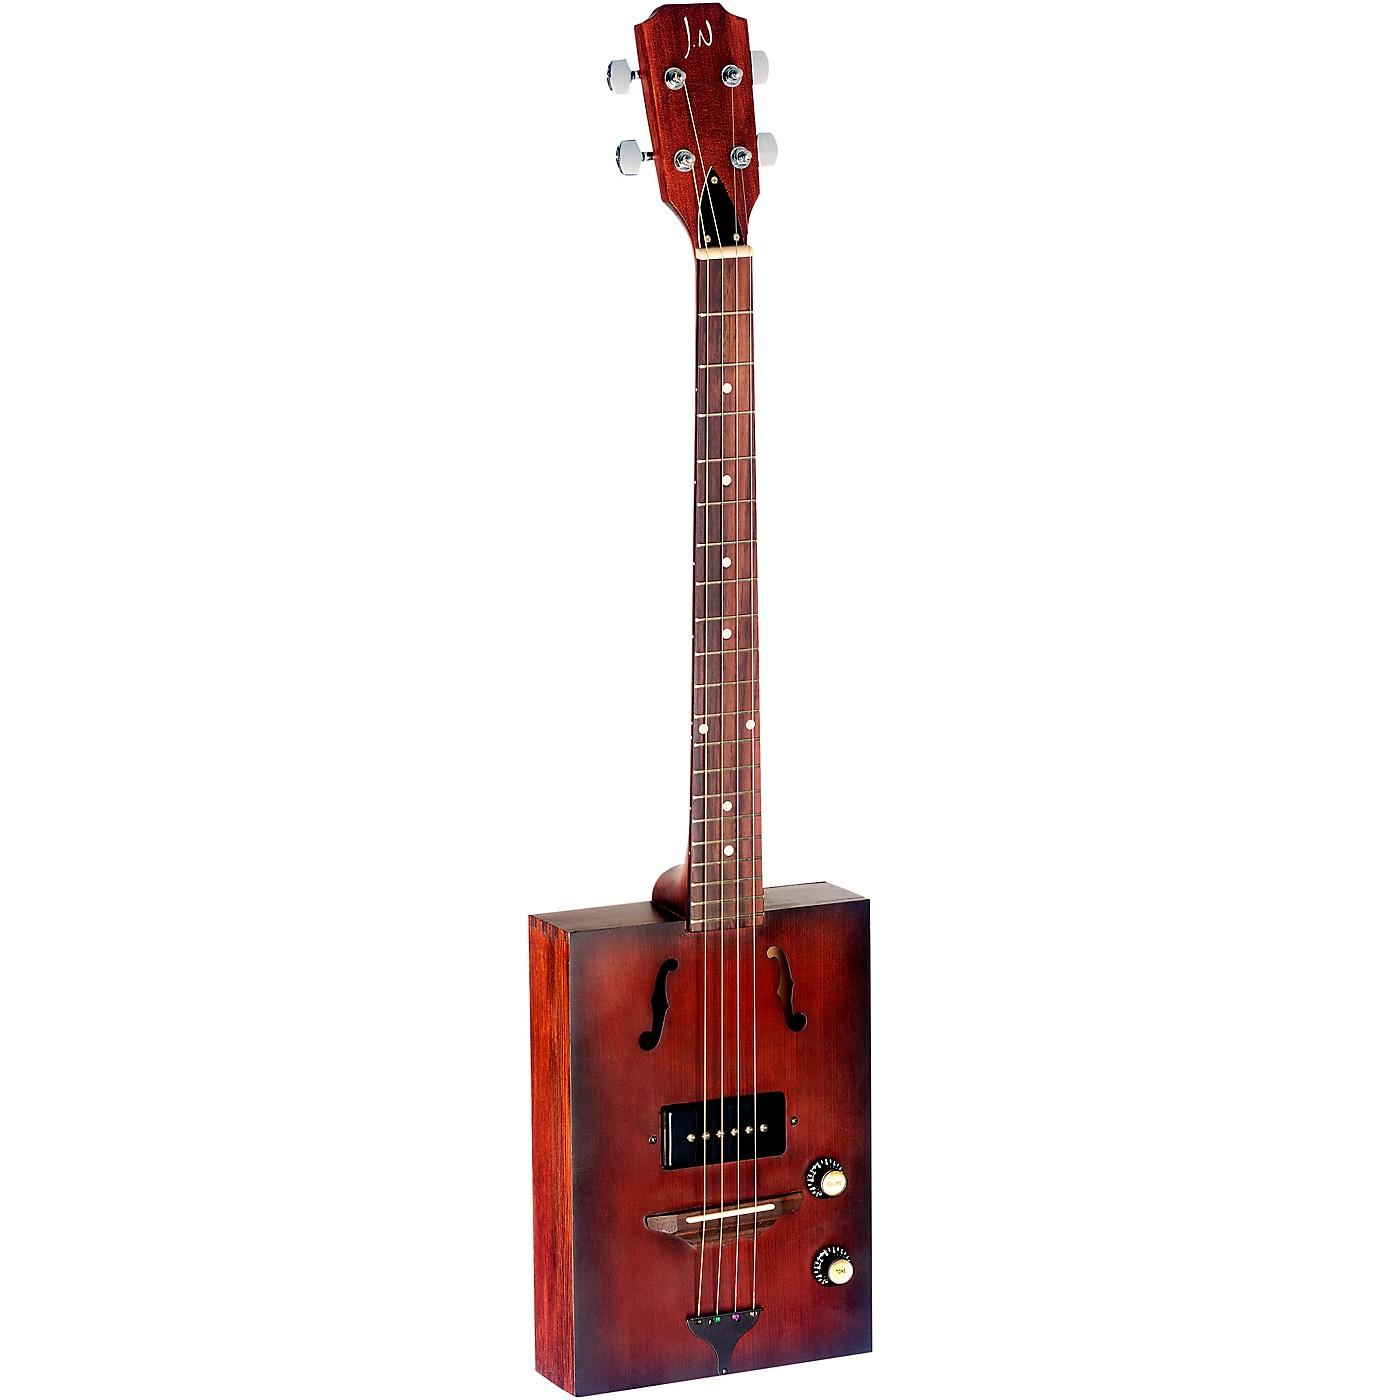 JN Guitars J.N. CASK Series Acoustic-Electric Cigar Box Guitar with Spruce Top thumbnail